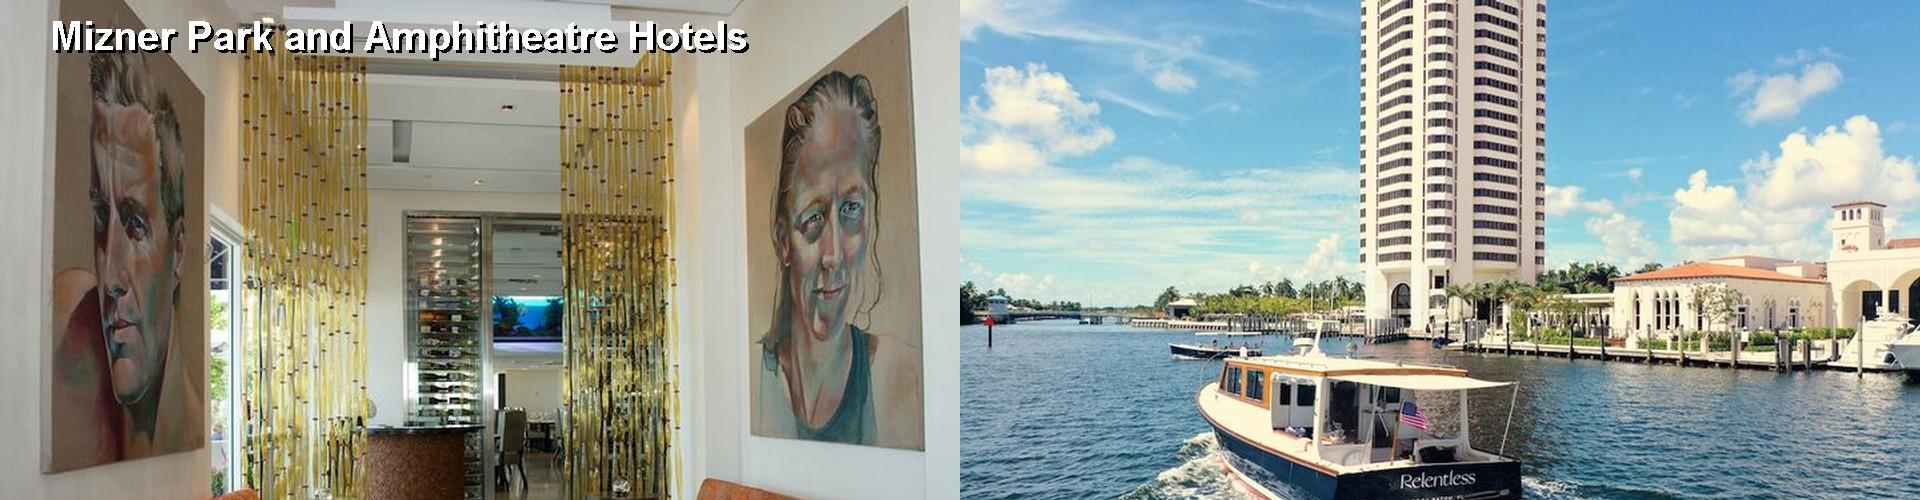 59 Hotels Near Mizner Park And Amphitheatre In Boca